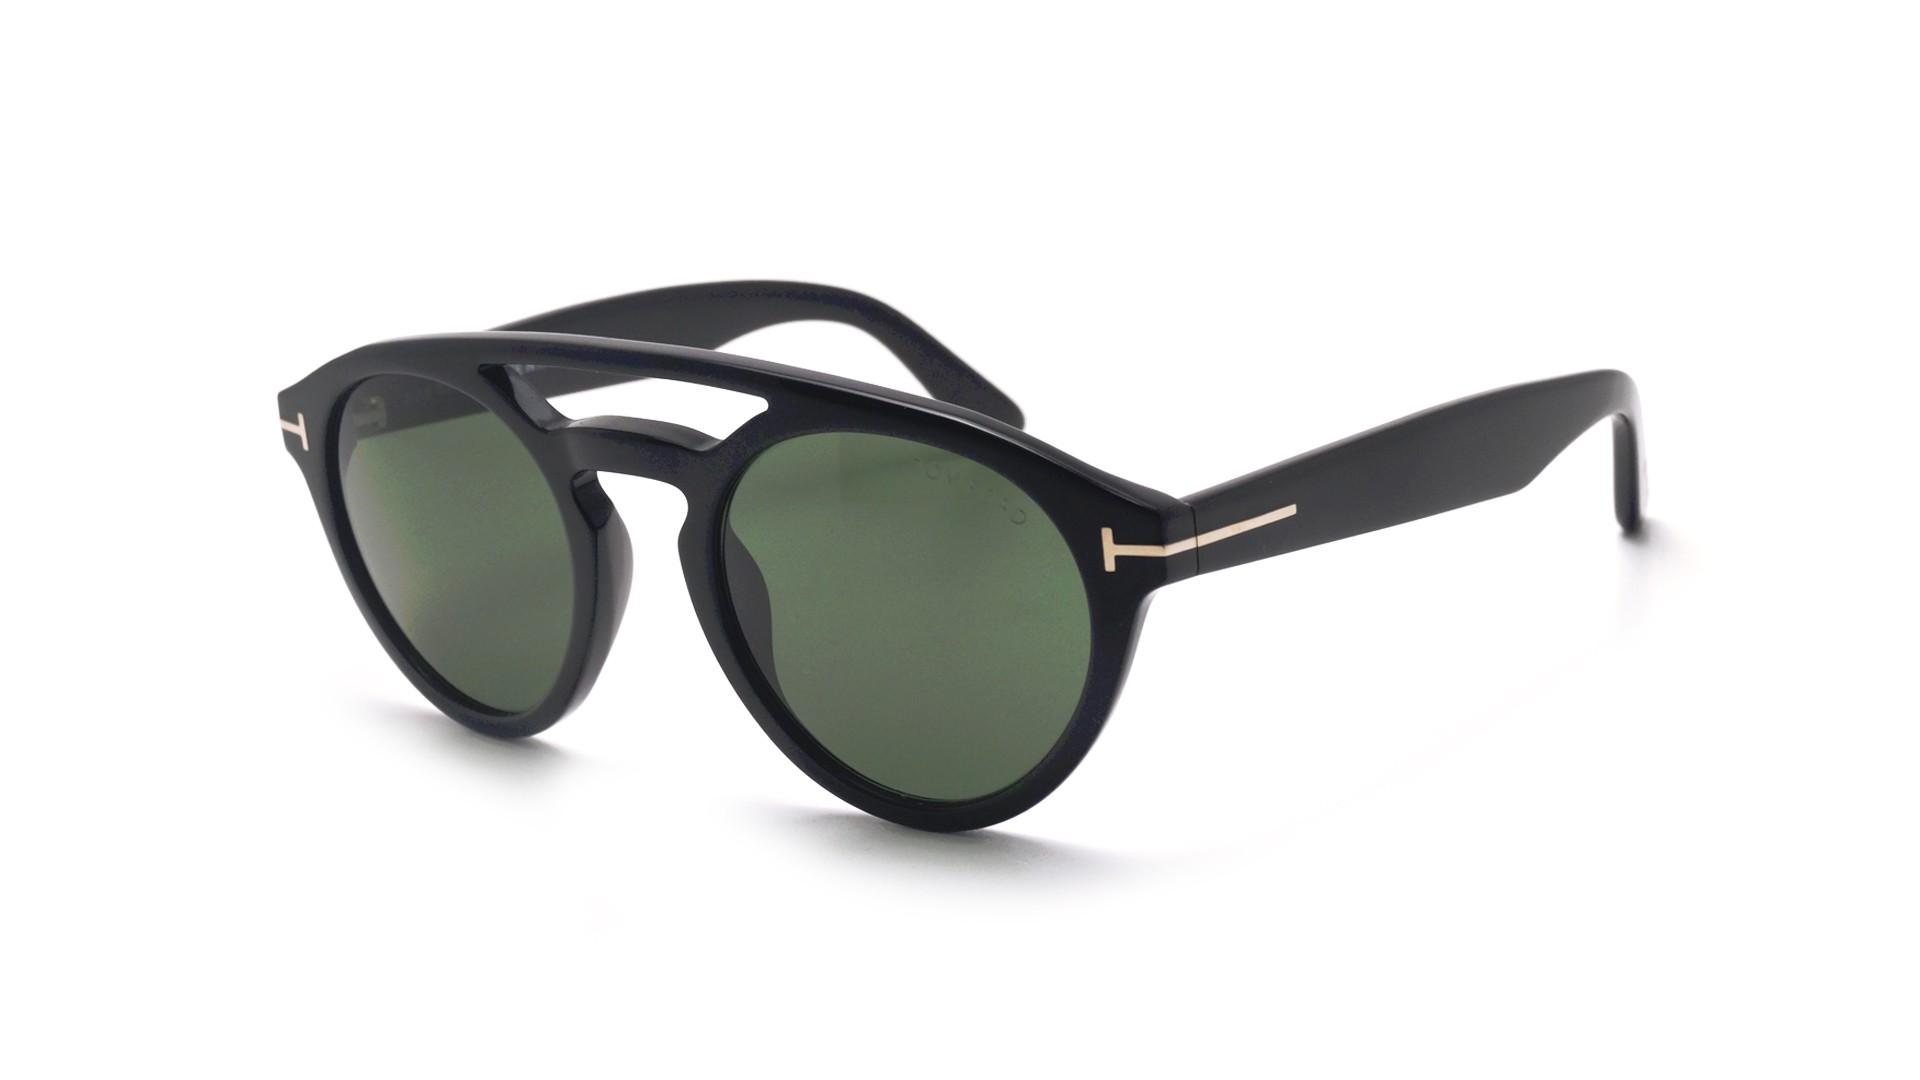 bab2792eeb Sunglasses Tom Ford Clint Black FT0537 01N 50-21 Medium